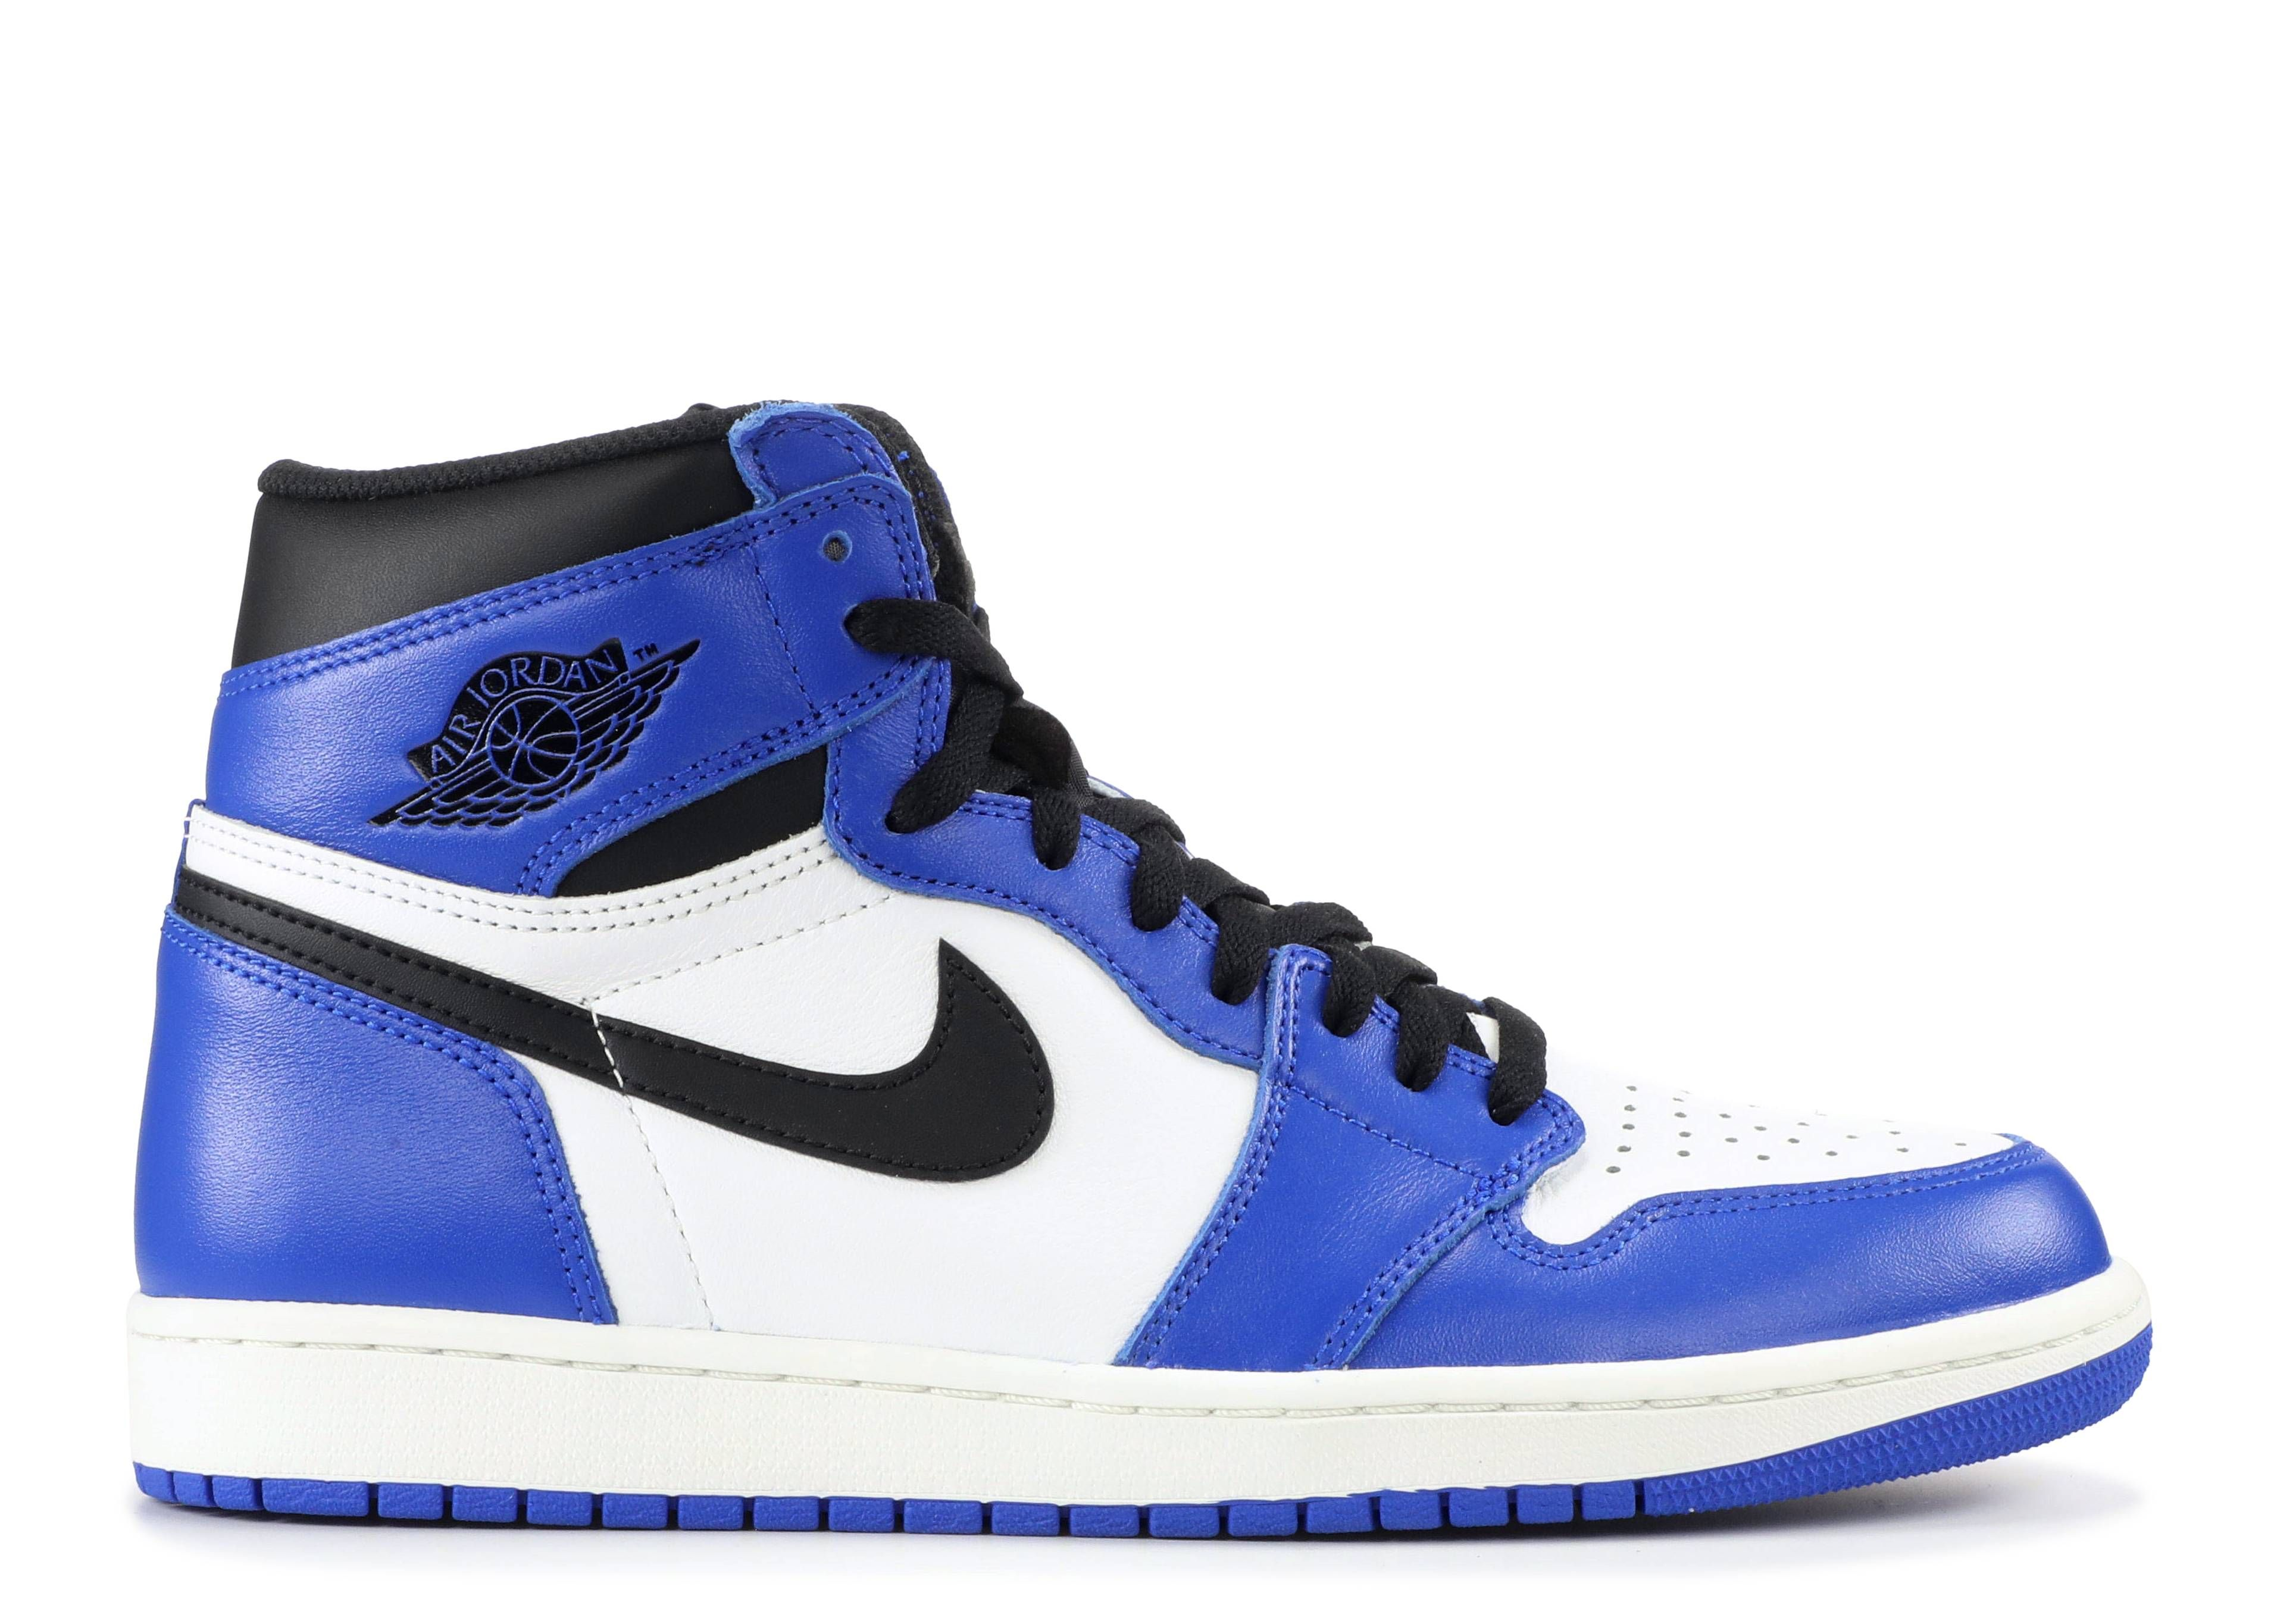 2017 Nike Air Jordan 1 Nike Retro High Og Royal Blue Pin On Shoes